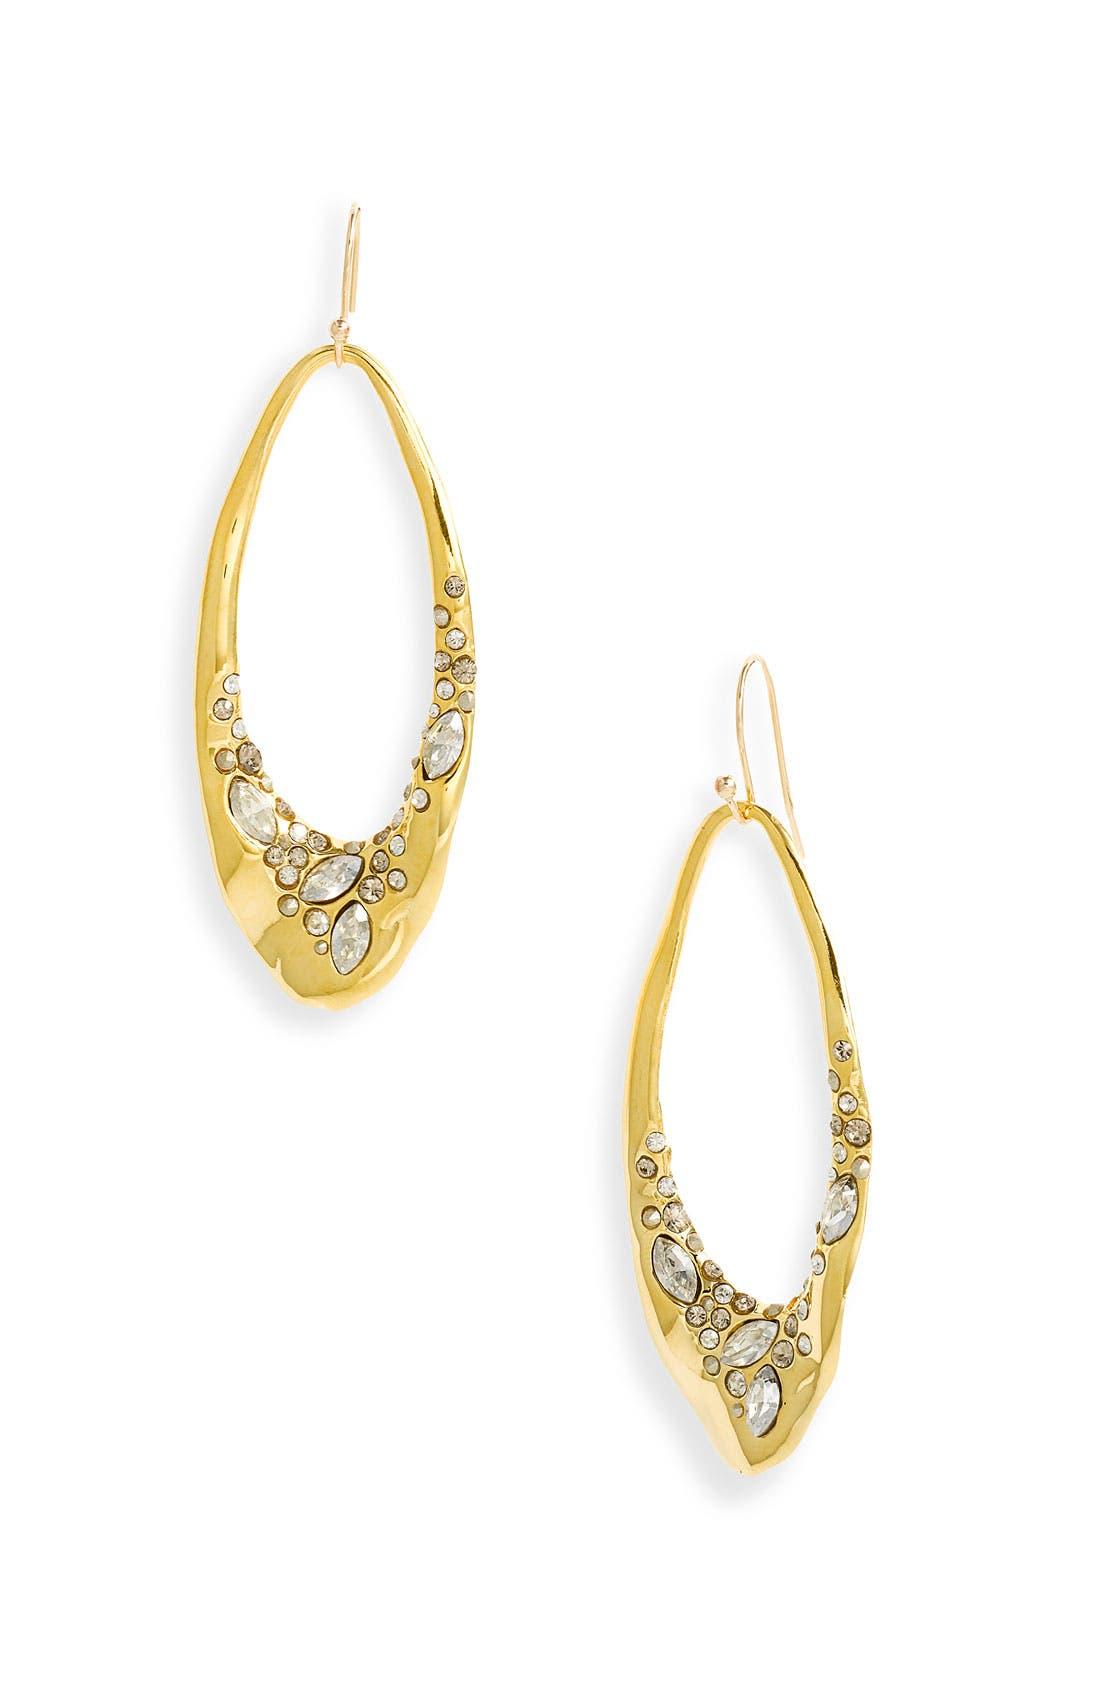 Alternate Image 1 Selected - Alexis Bittar 'Miss Havisham' Encrusted Liquid Link Earrings